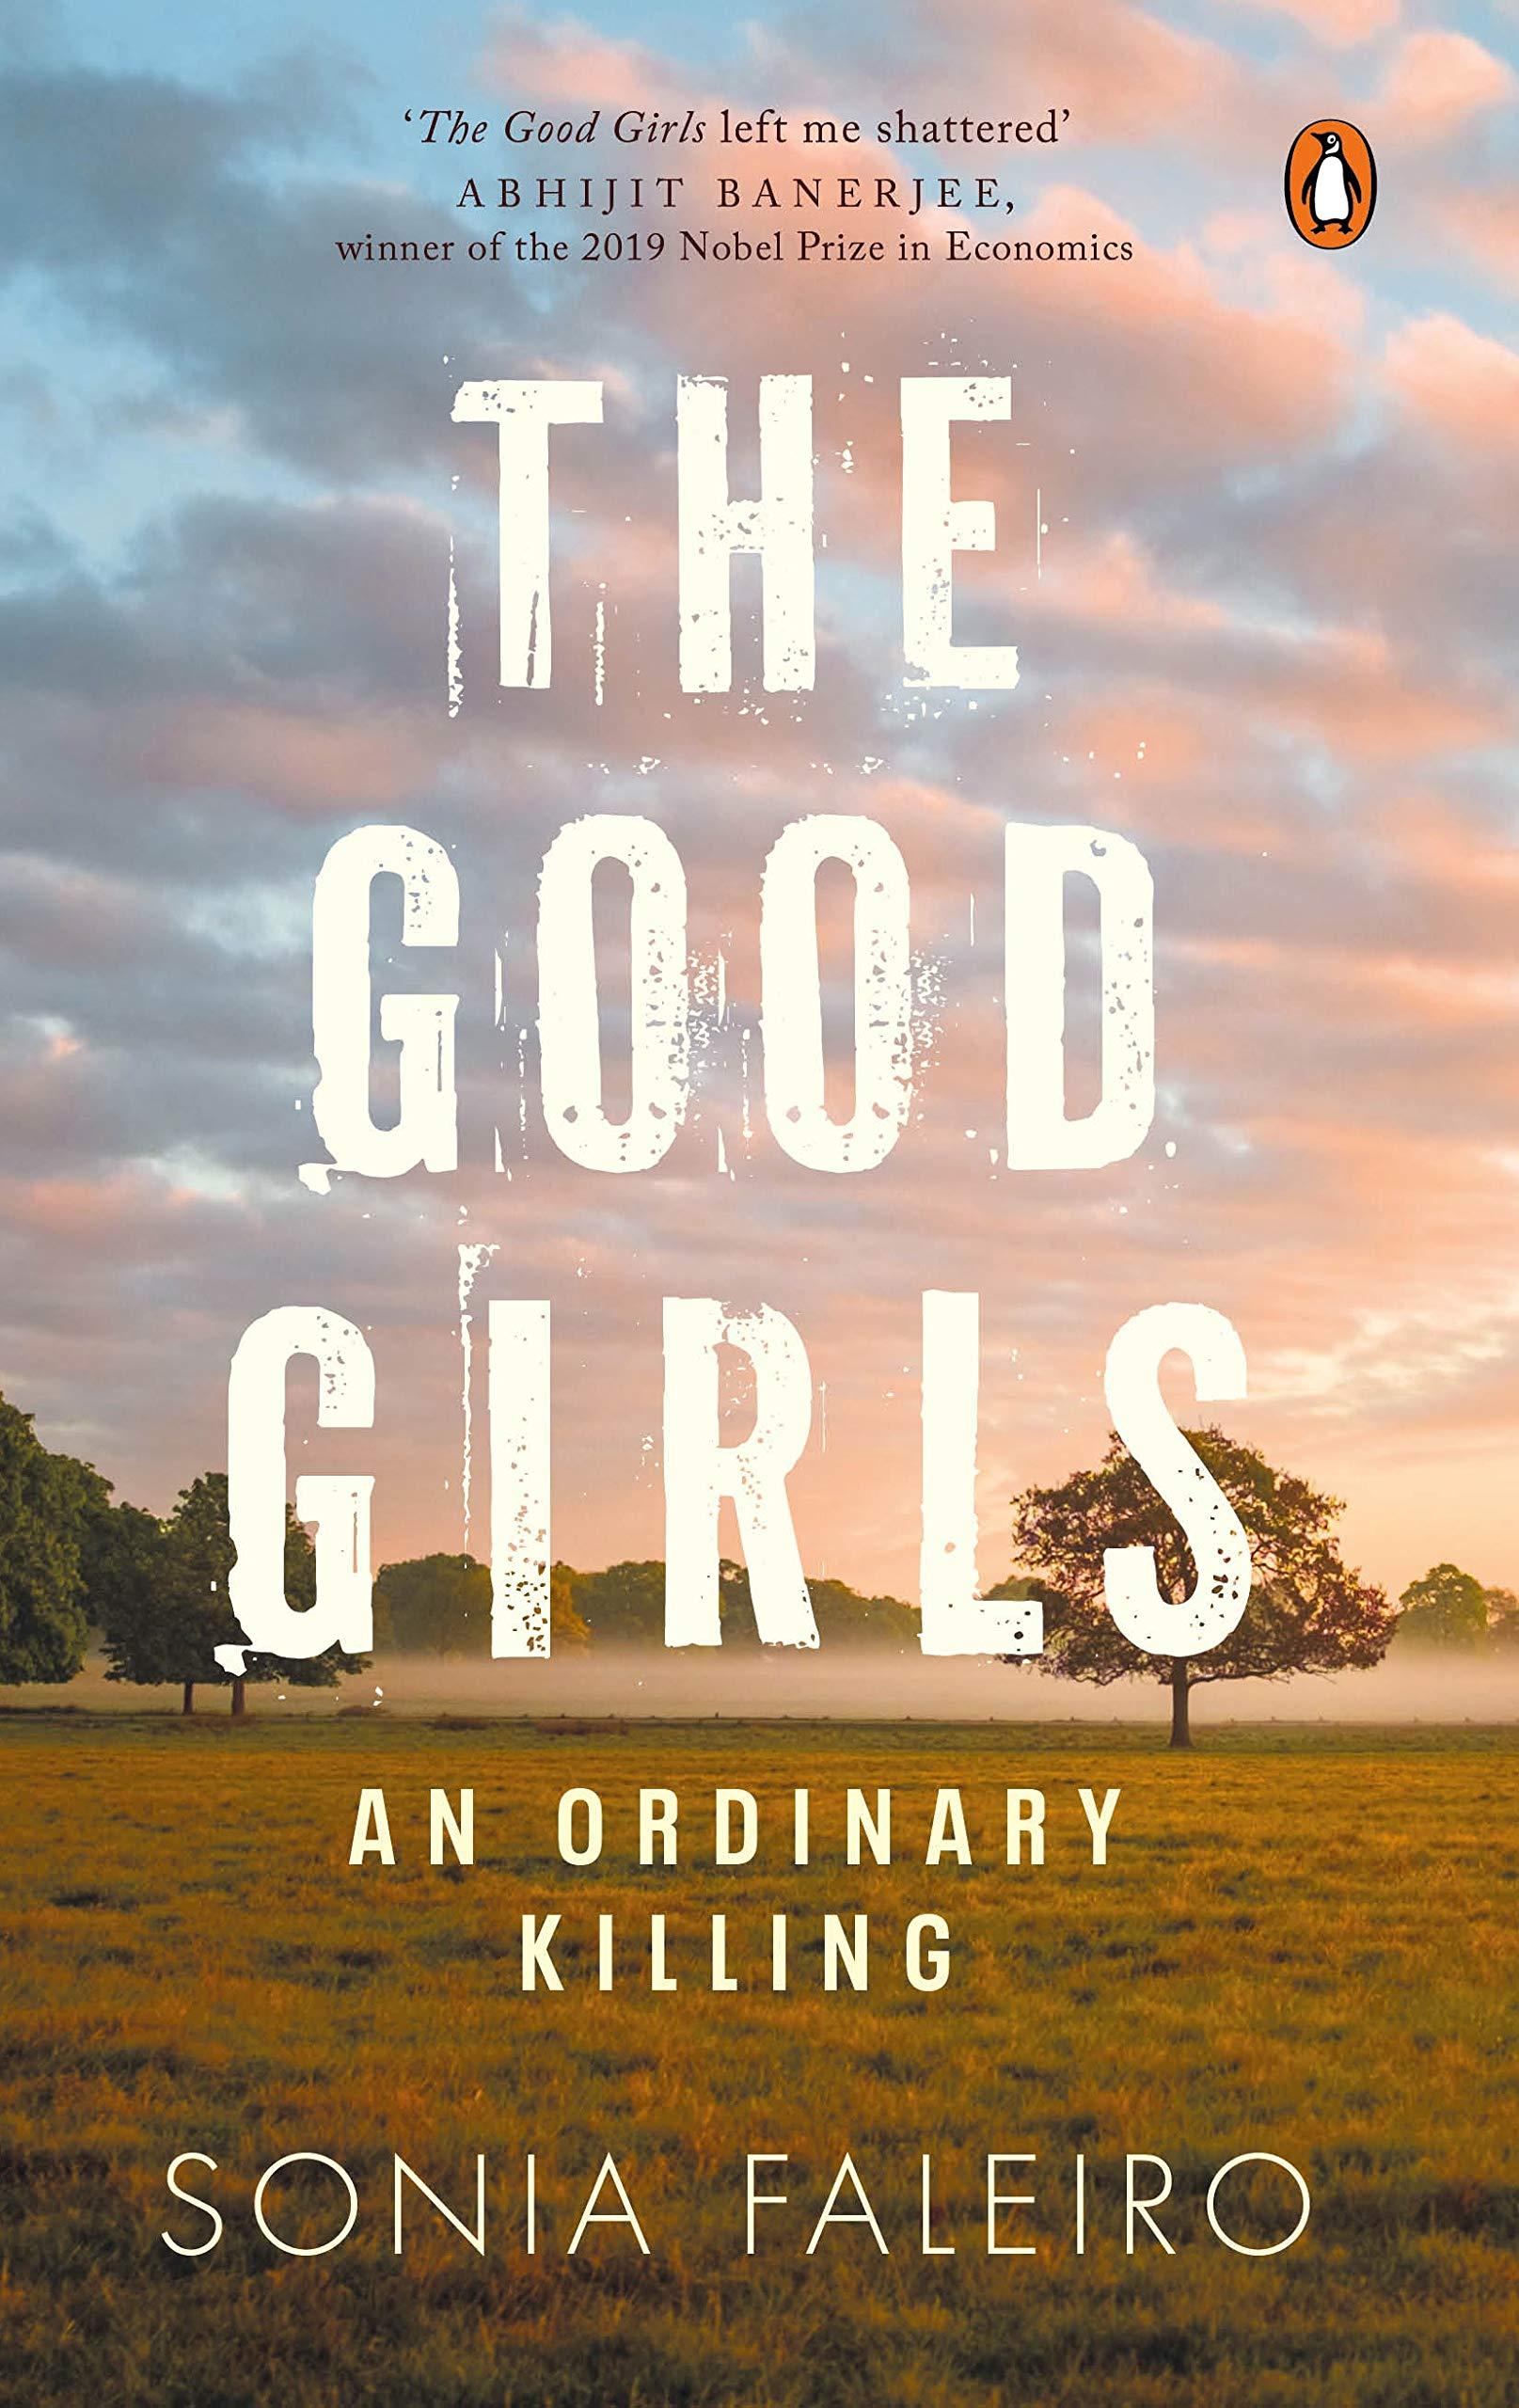 The Good Girls: An Ordinary Killing  by Sonia Faleiro, Hamish Hamilton, Rs 599